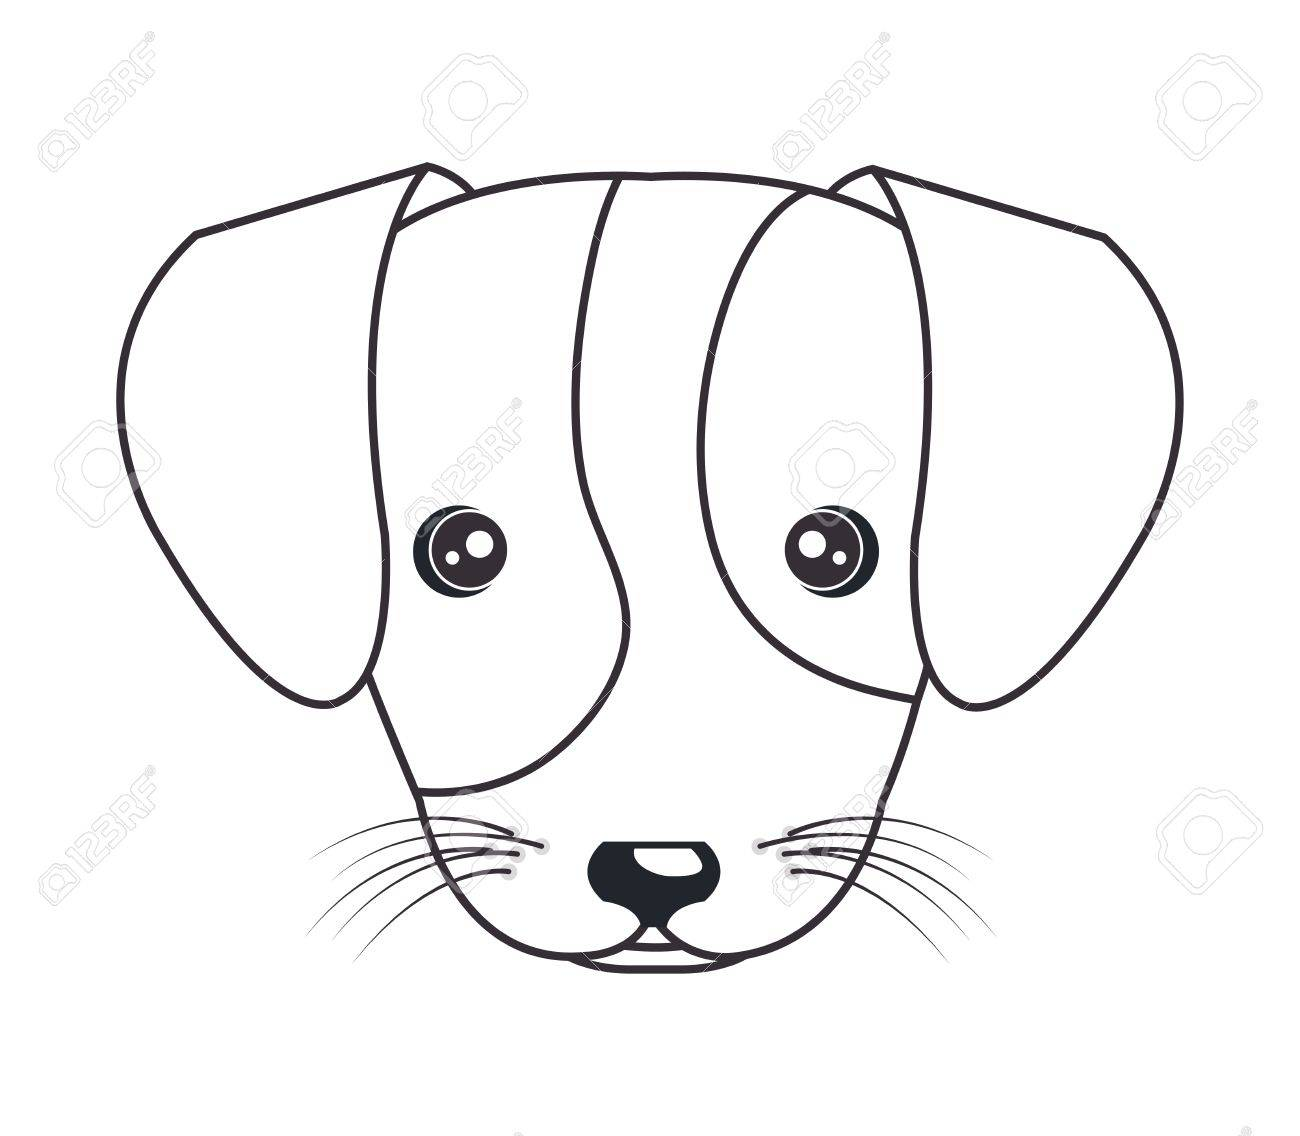 Cute Puppies Drawing At Getdrawings